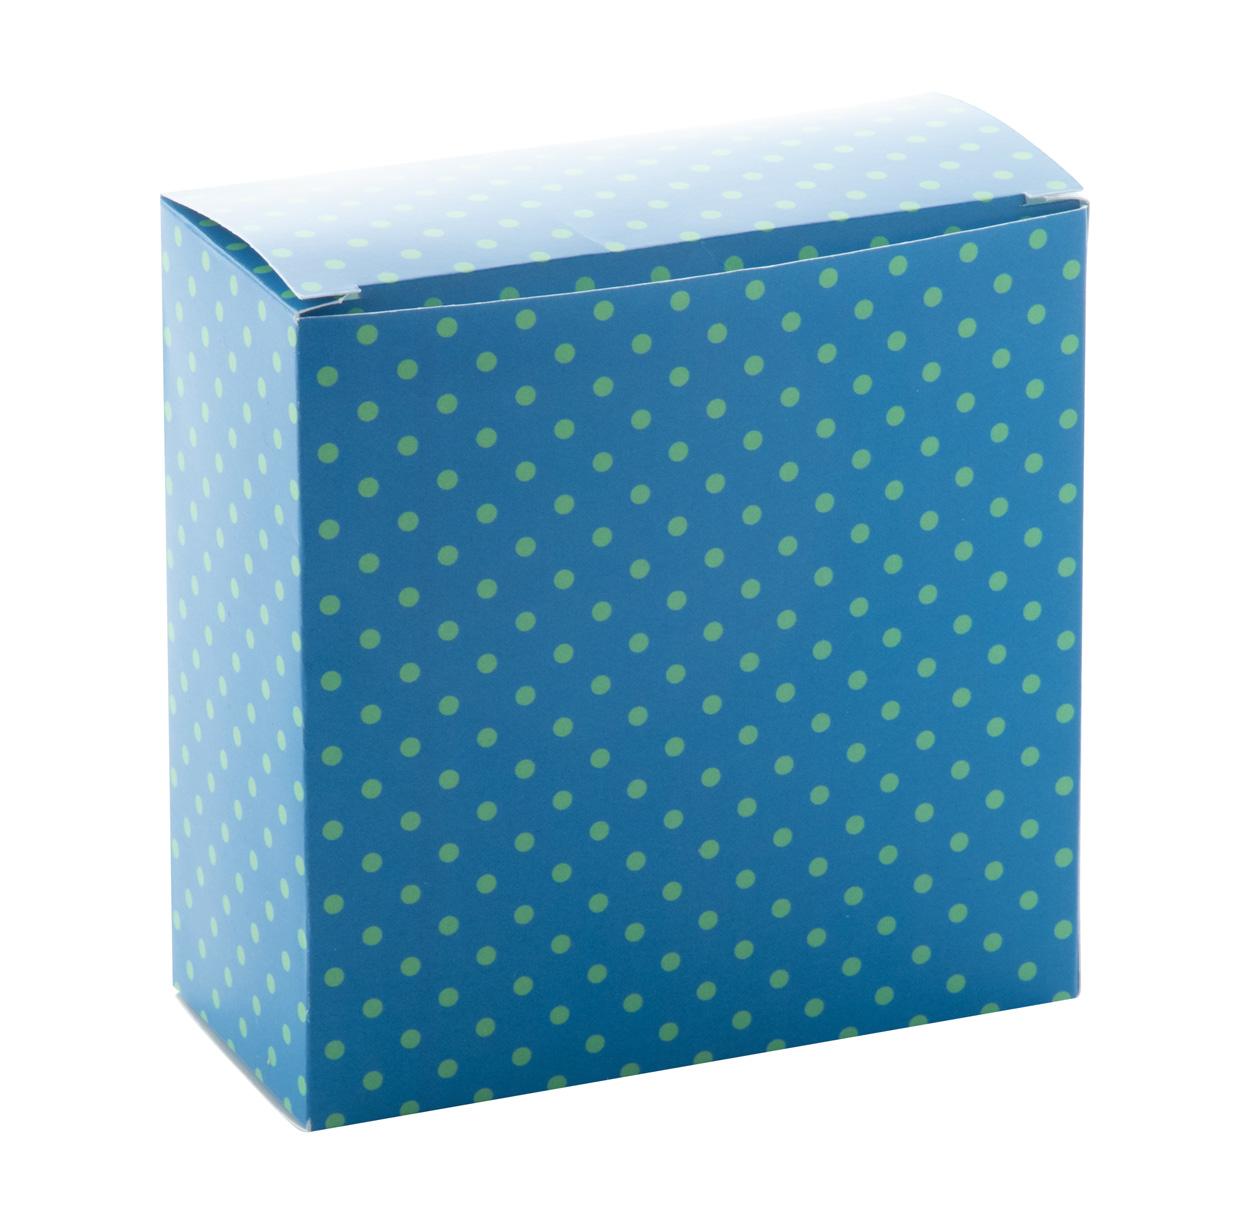 CreaBox Lens A custom box